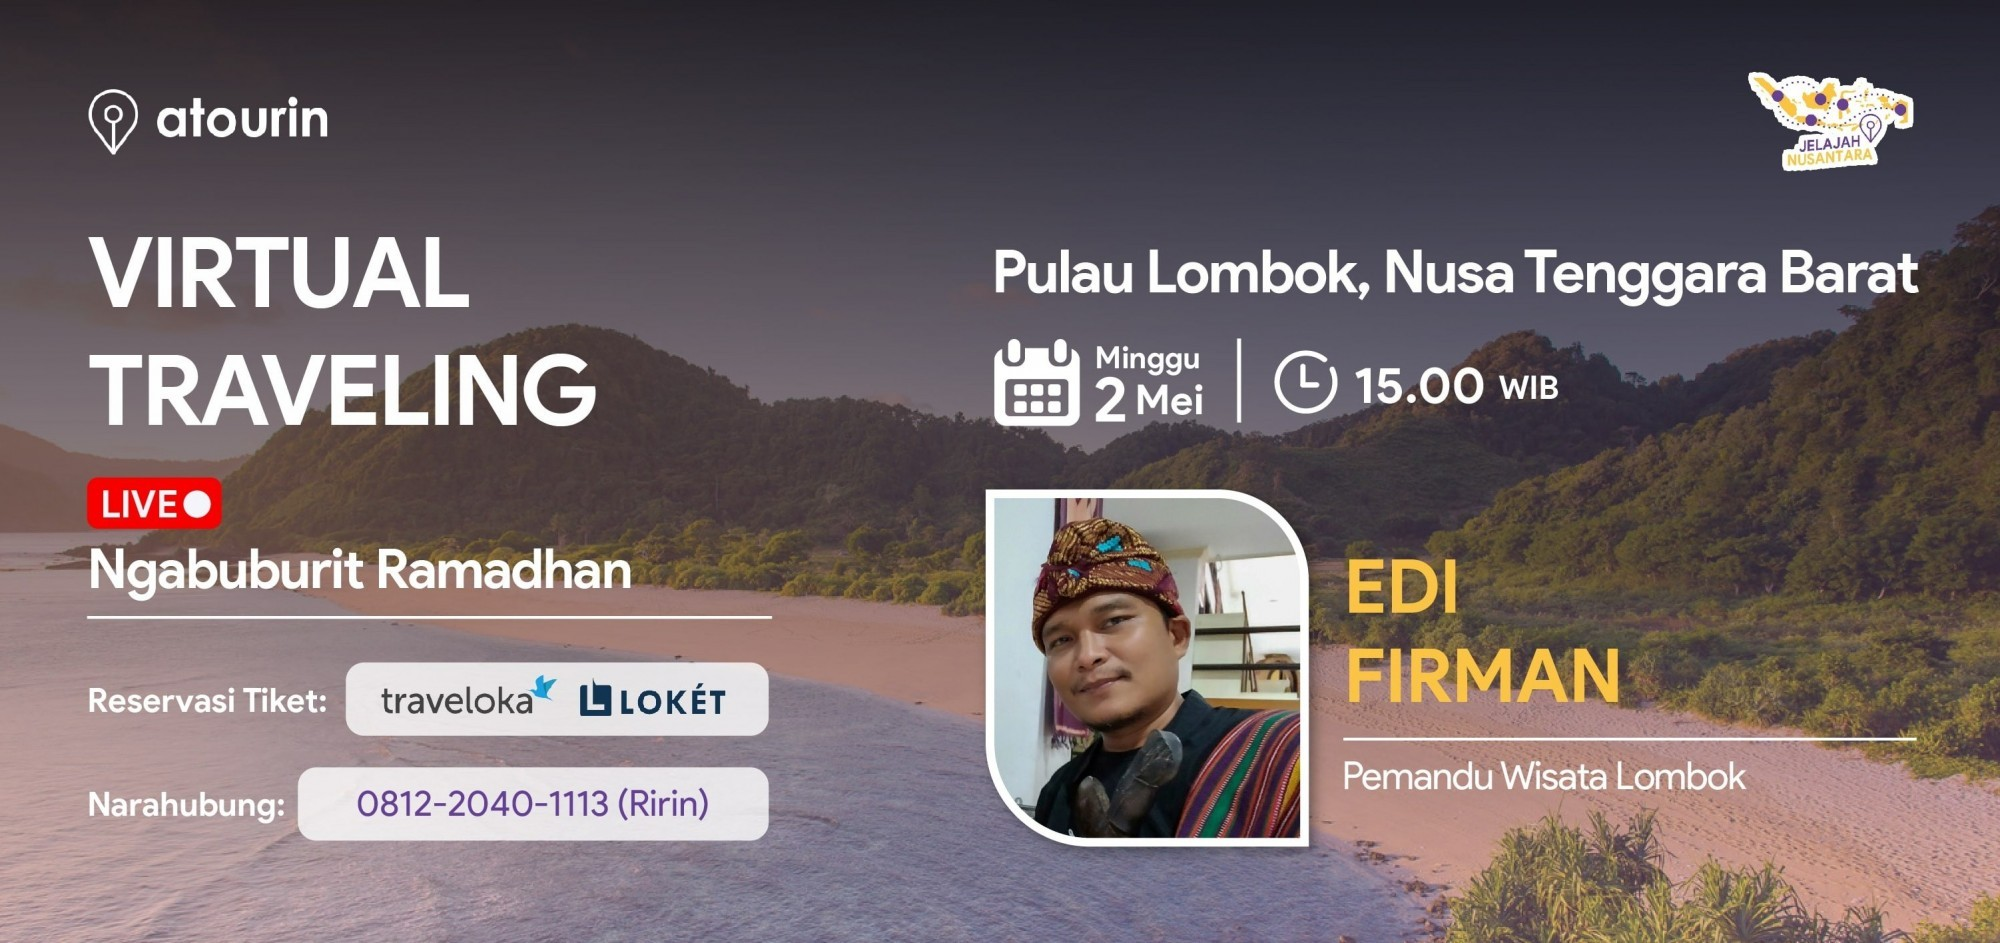 Ngabuburit LIVE dari Pulau Lombok, Nusa Tenggara Barat